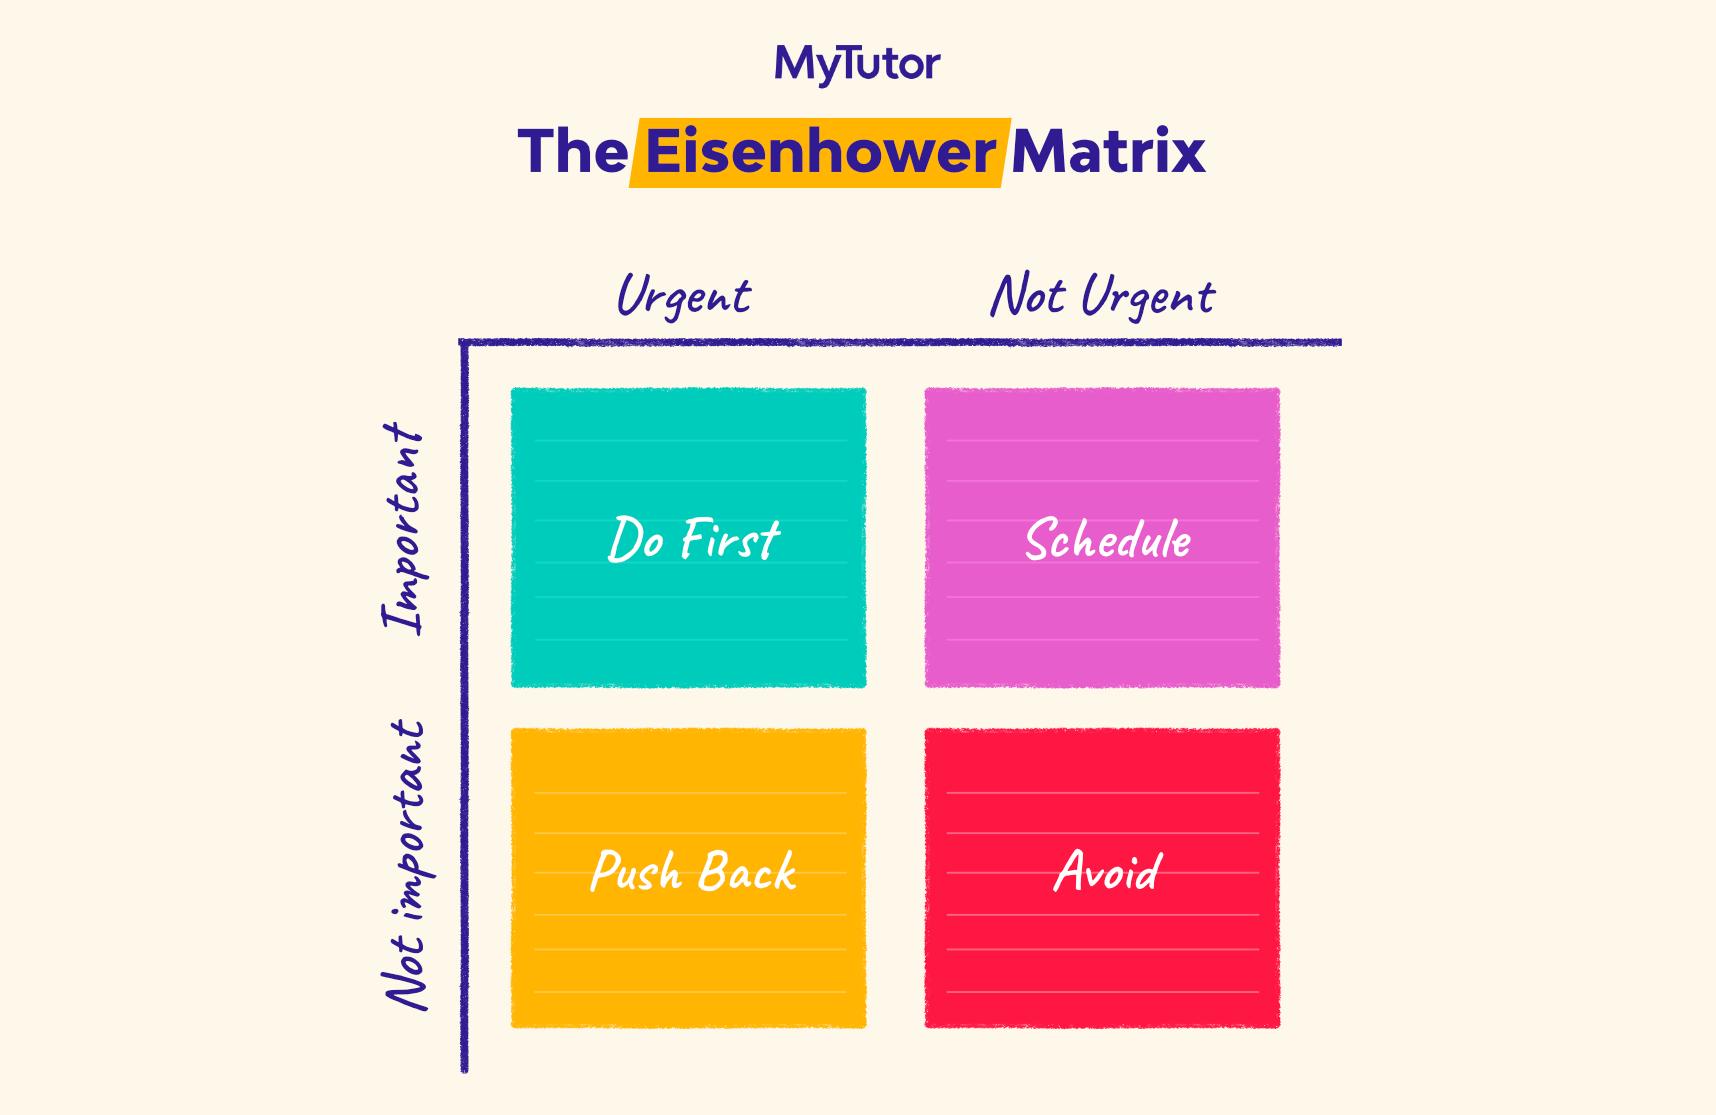 mytutor-the-eisenhower-matrix